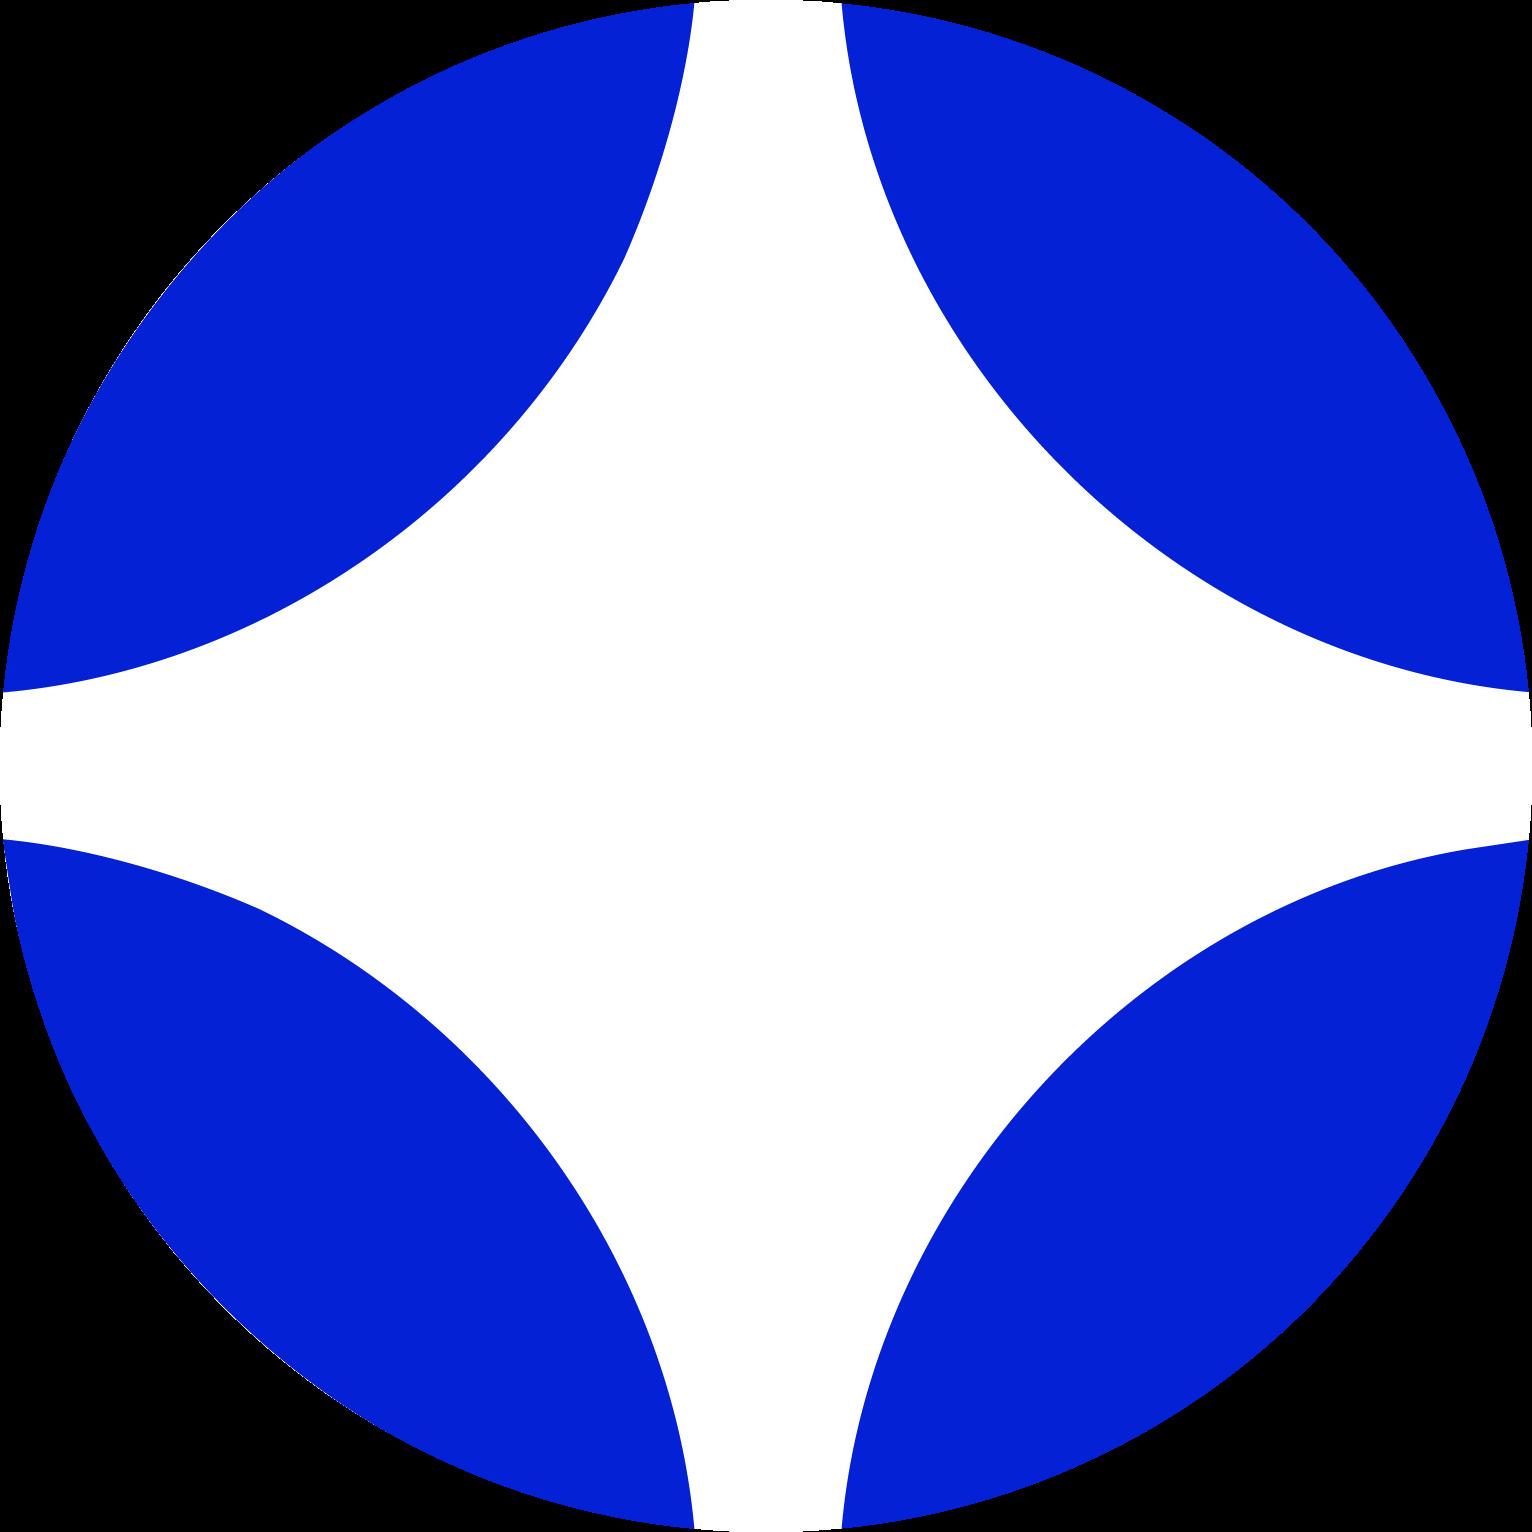 circle-cropped (10)-Jun-01-2021-07-29-18-76-AM